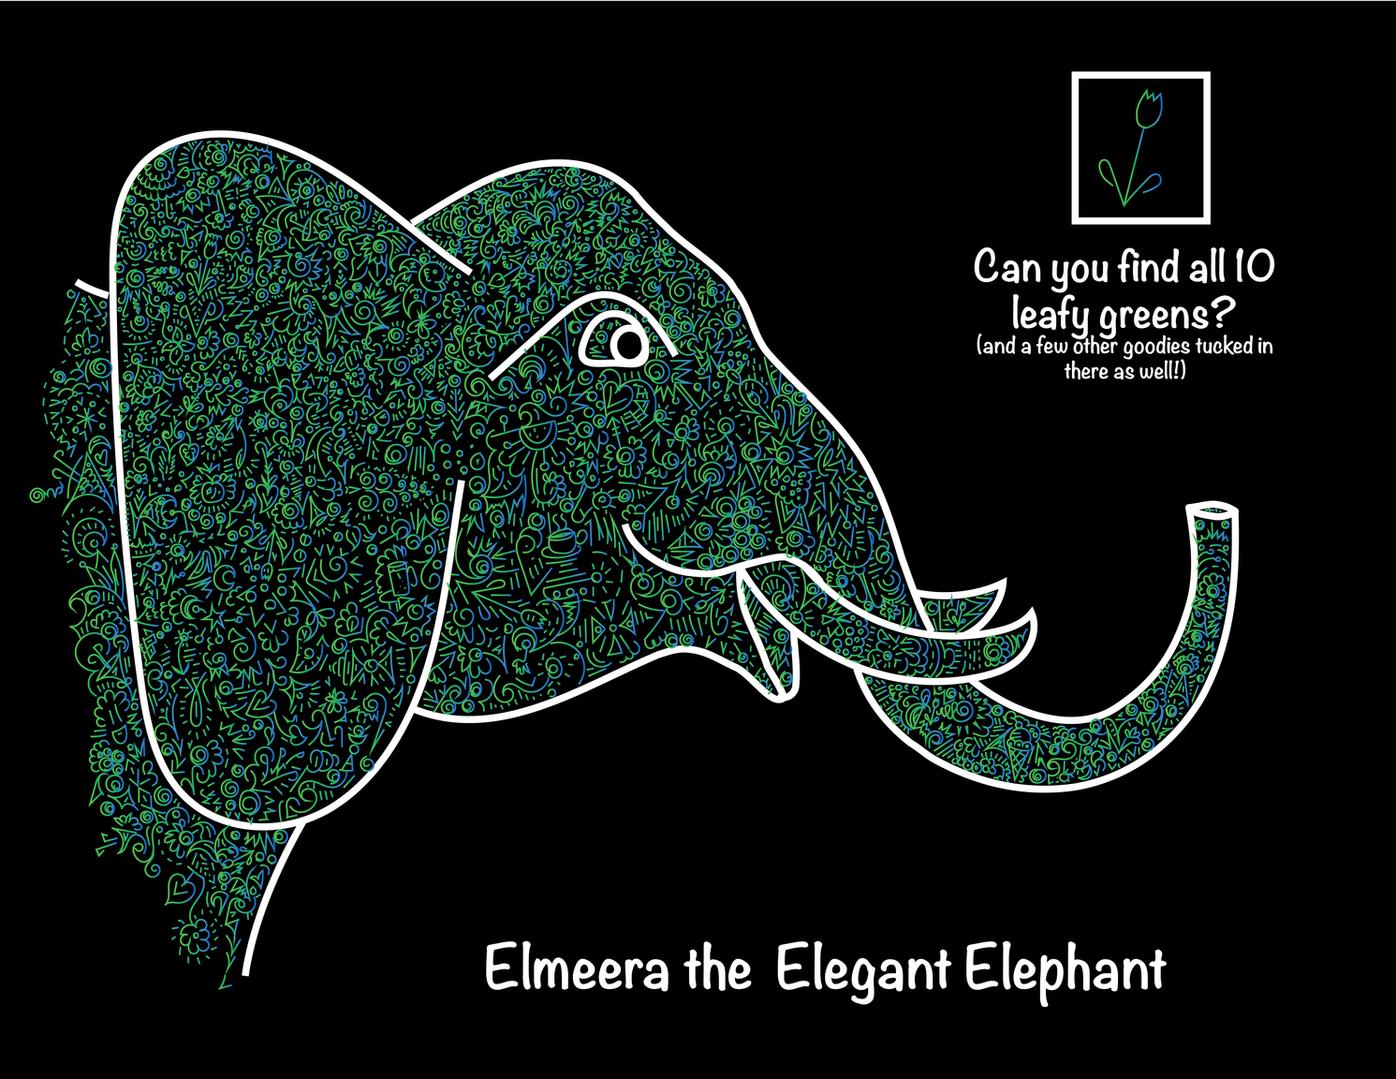 Elmeera the Elegant Elephant